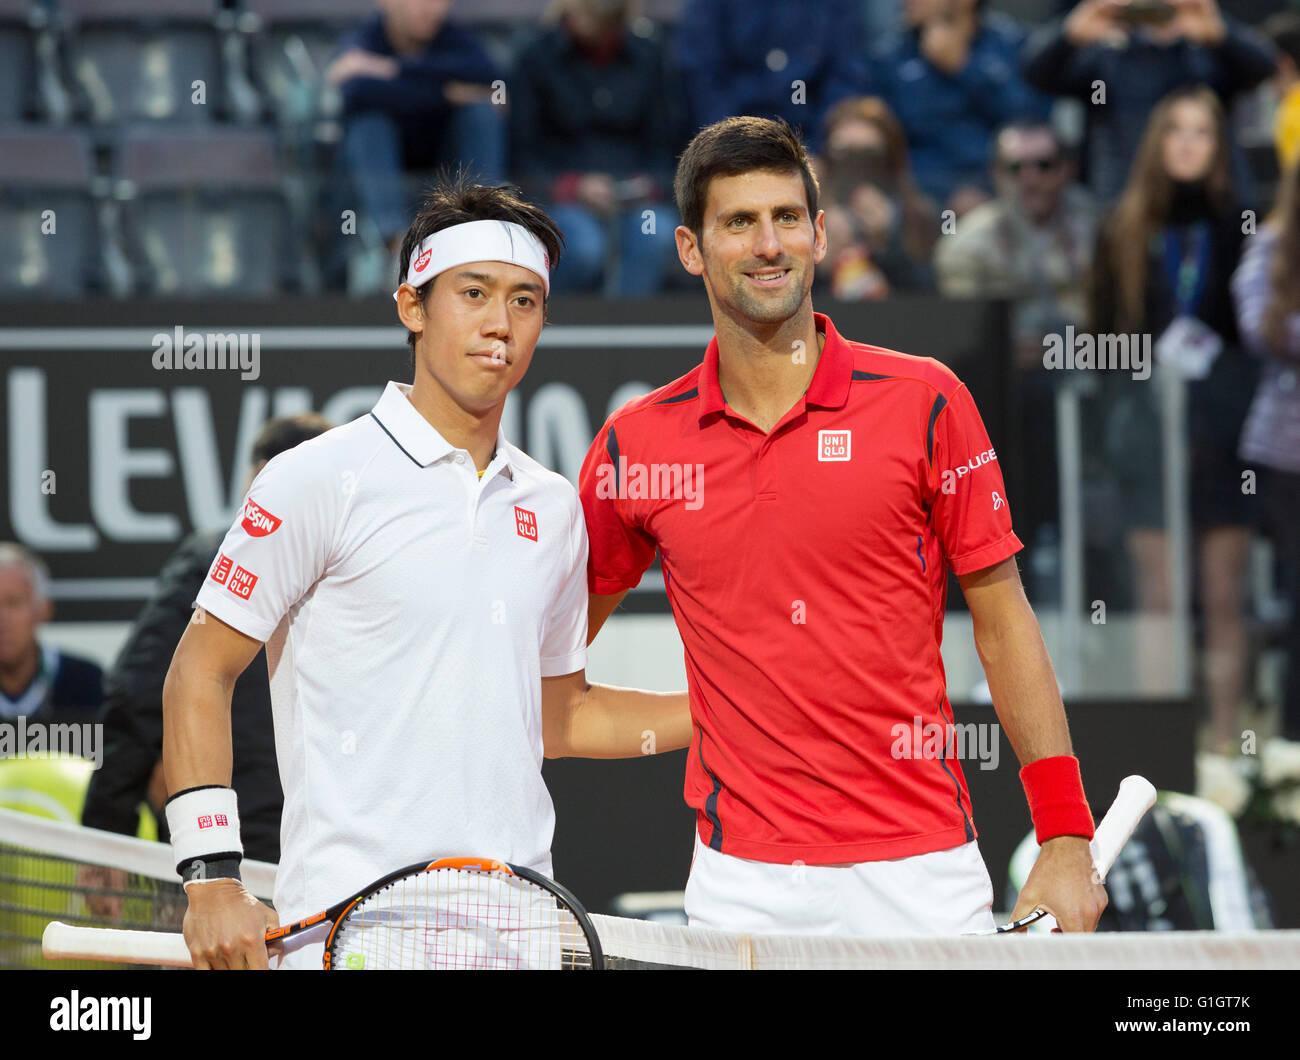 Rome, Italy. 14th May, 2016. Novak Djokovic and Kei Nishikori together before men's singles semi final match - Stock Image